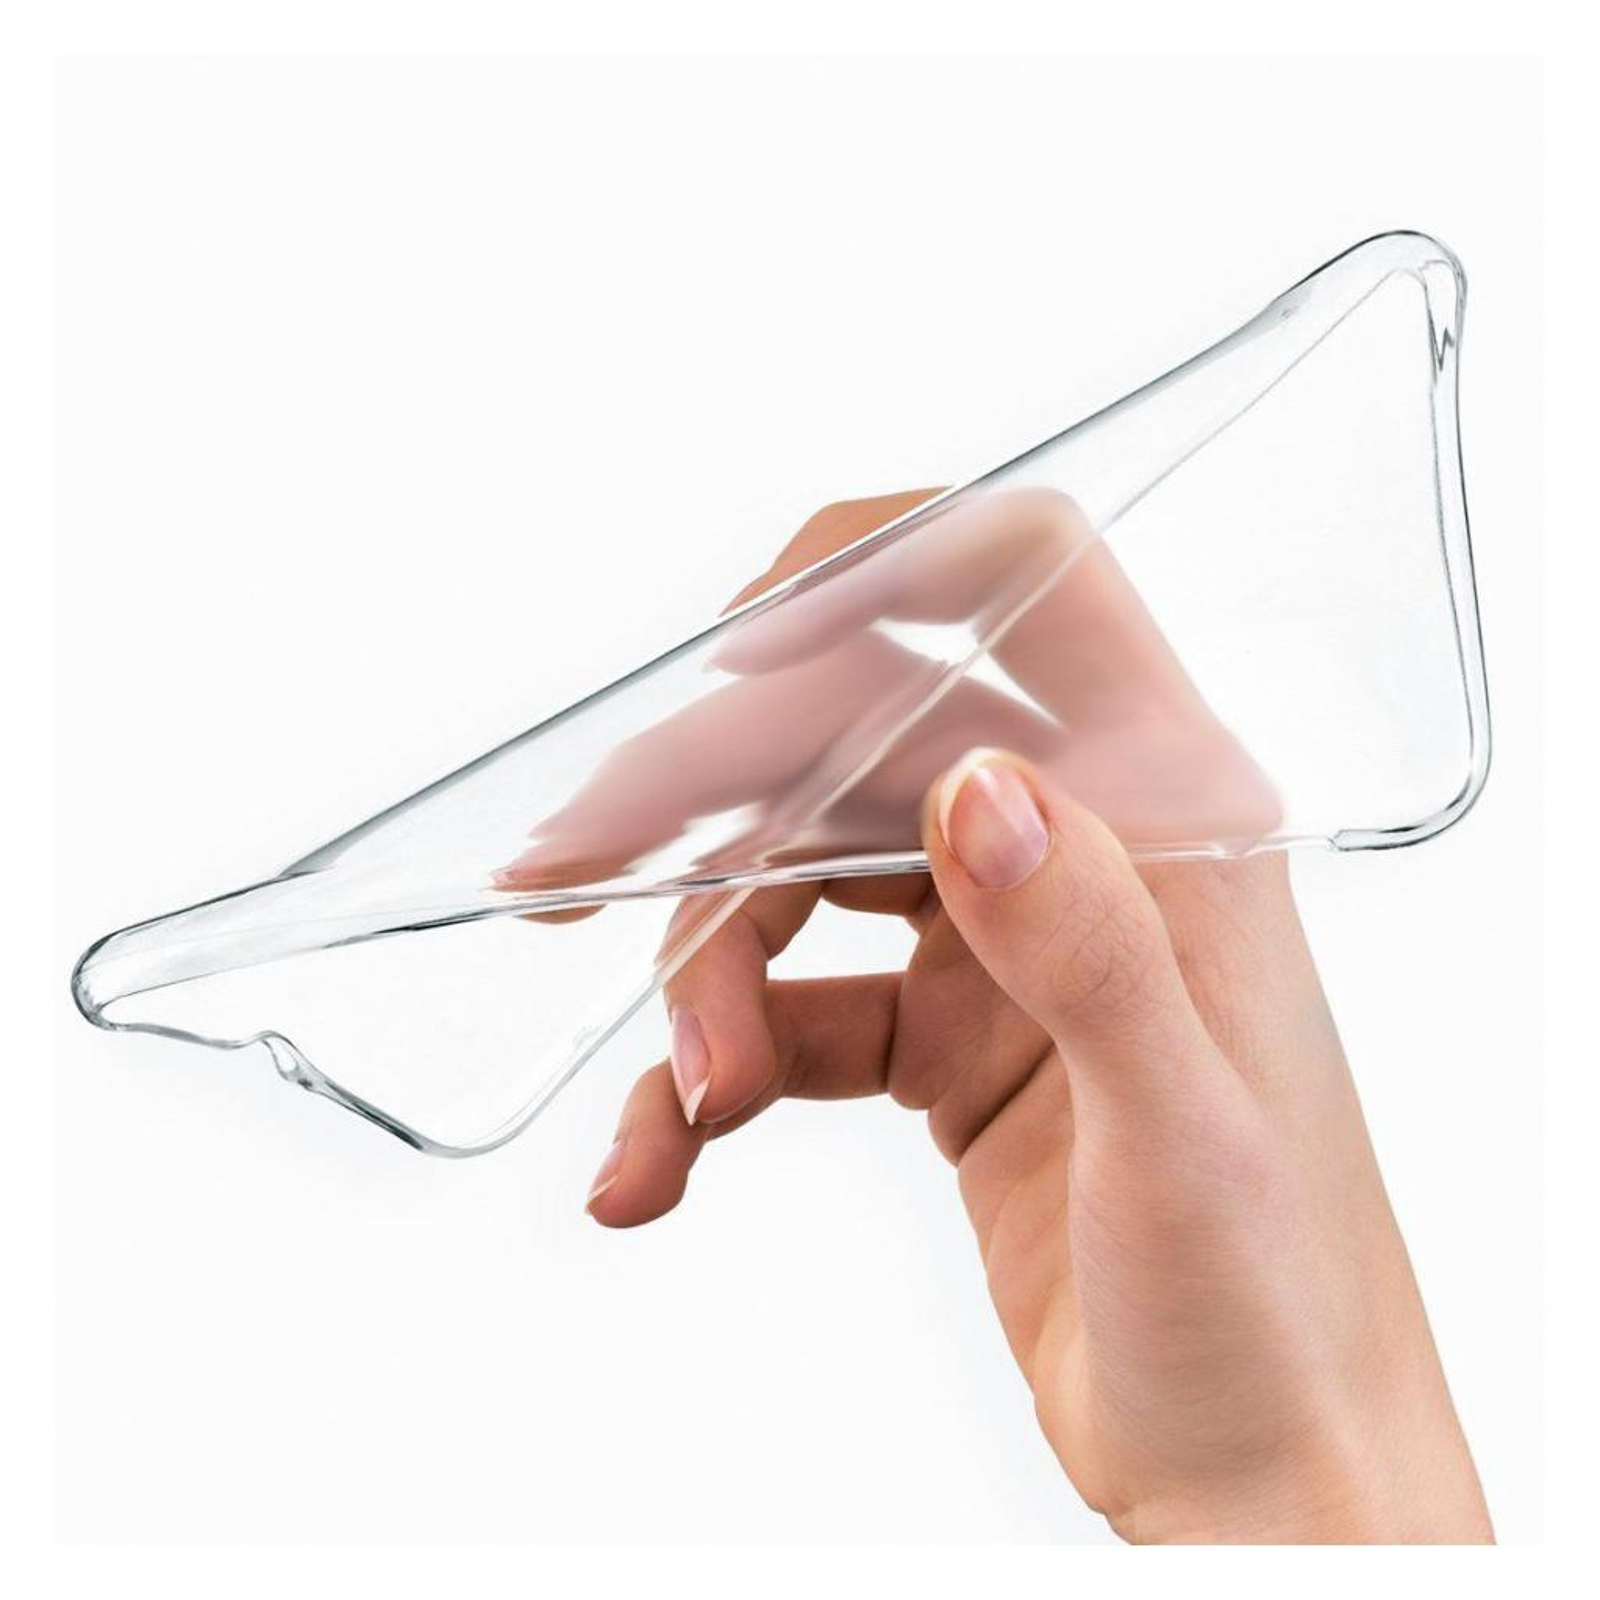 Чехол для моб. телефона SmartCase Samsung Galaxy A3 /A320 TPU Clear (SC-A3) изображение 6